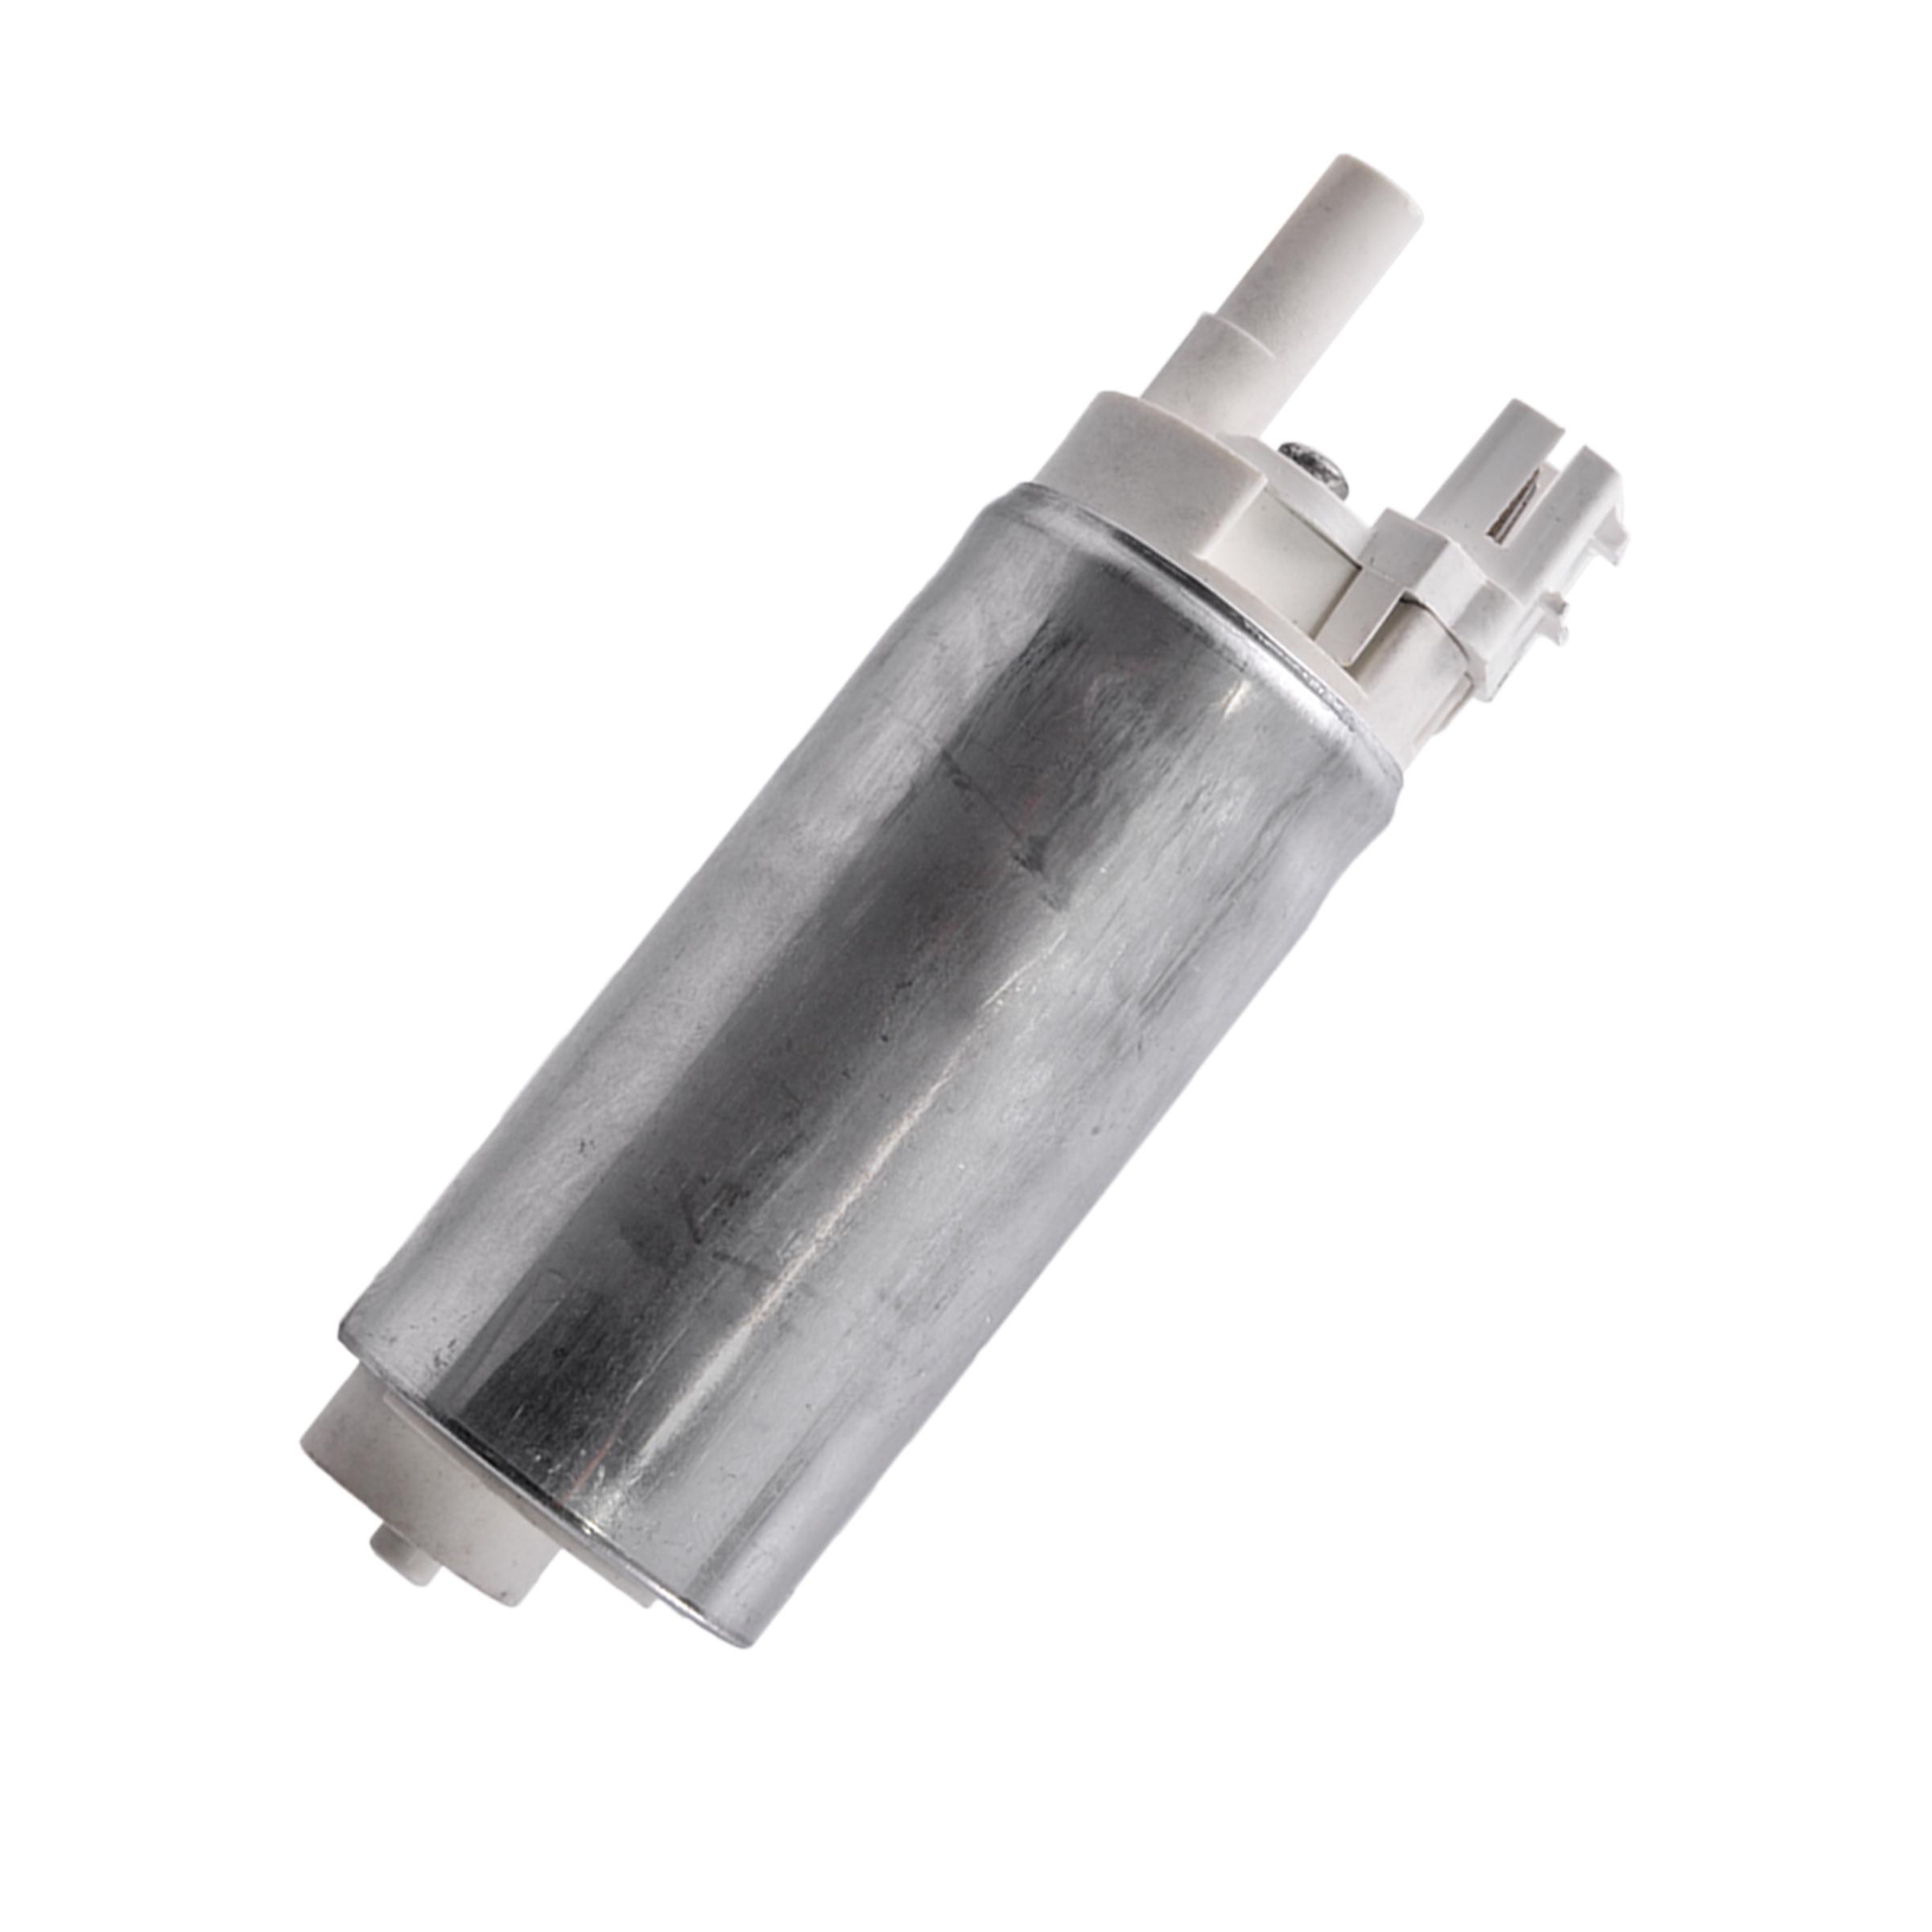 Bosch Fuel pump Repair Manual